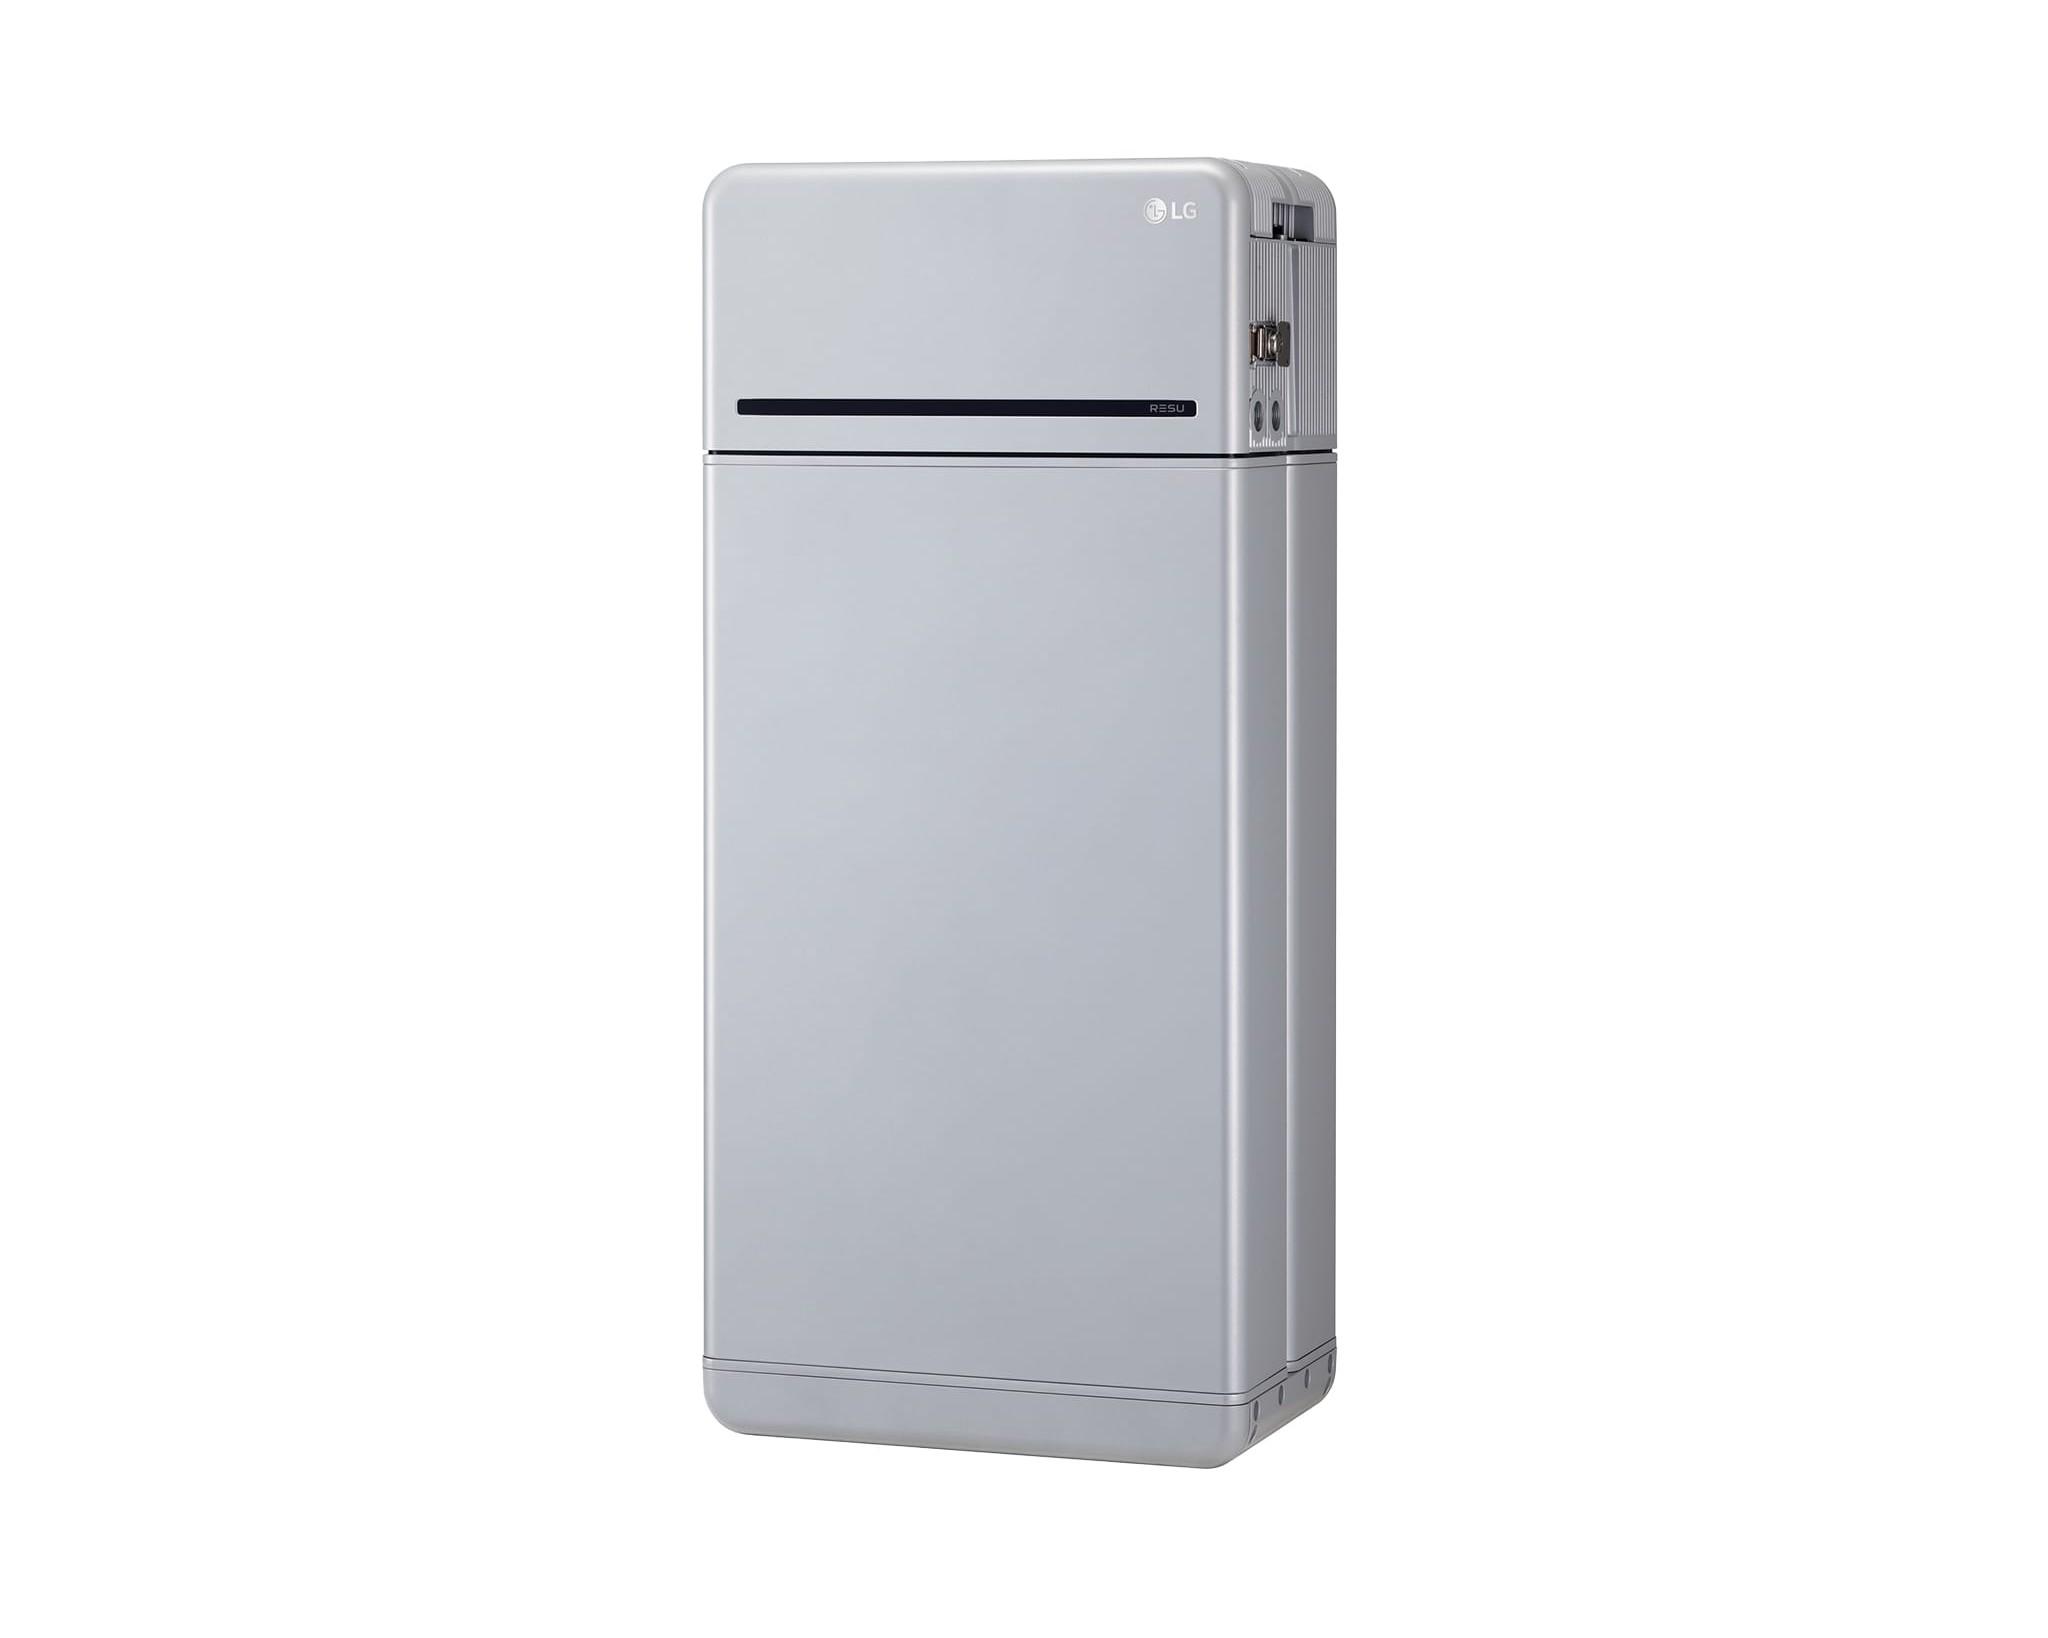 Green House Solutions zonnepanelen batterijopslag laadpalen airconditioning LG Chem Prime Batterij 000004